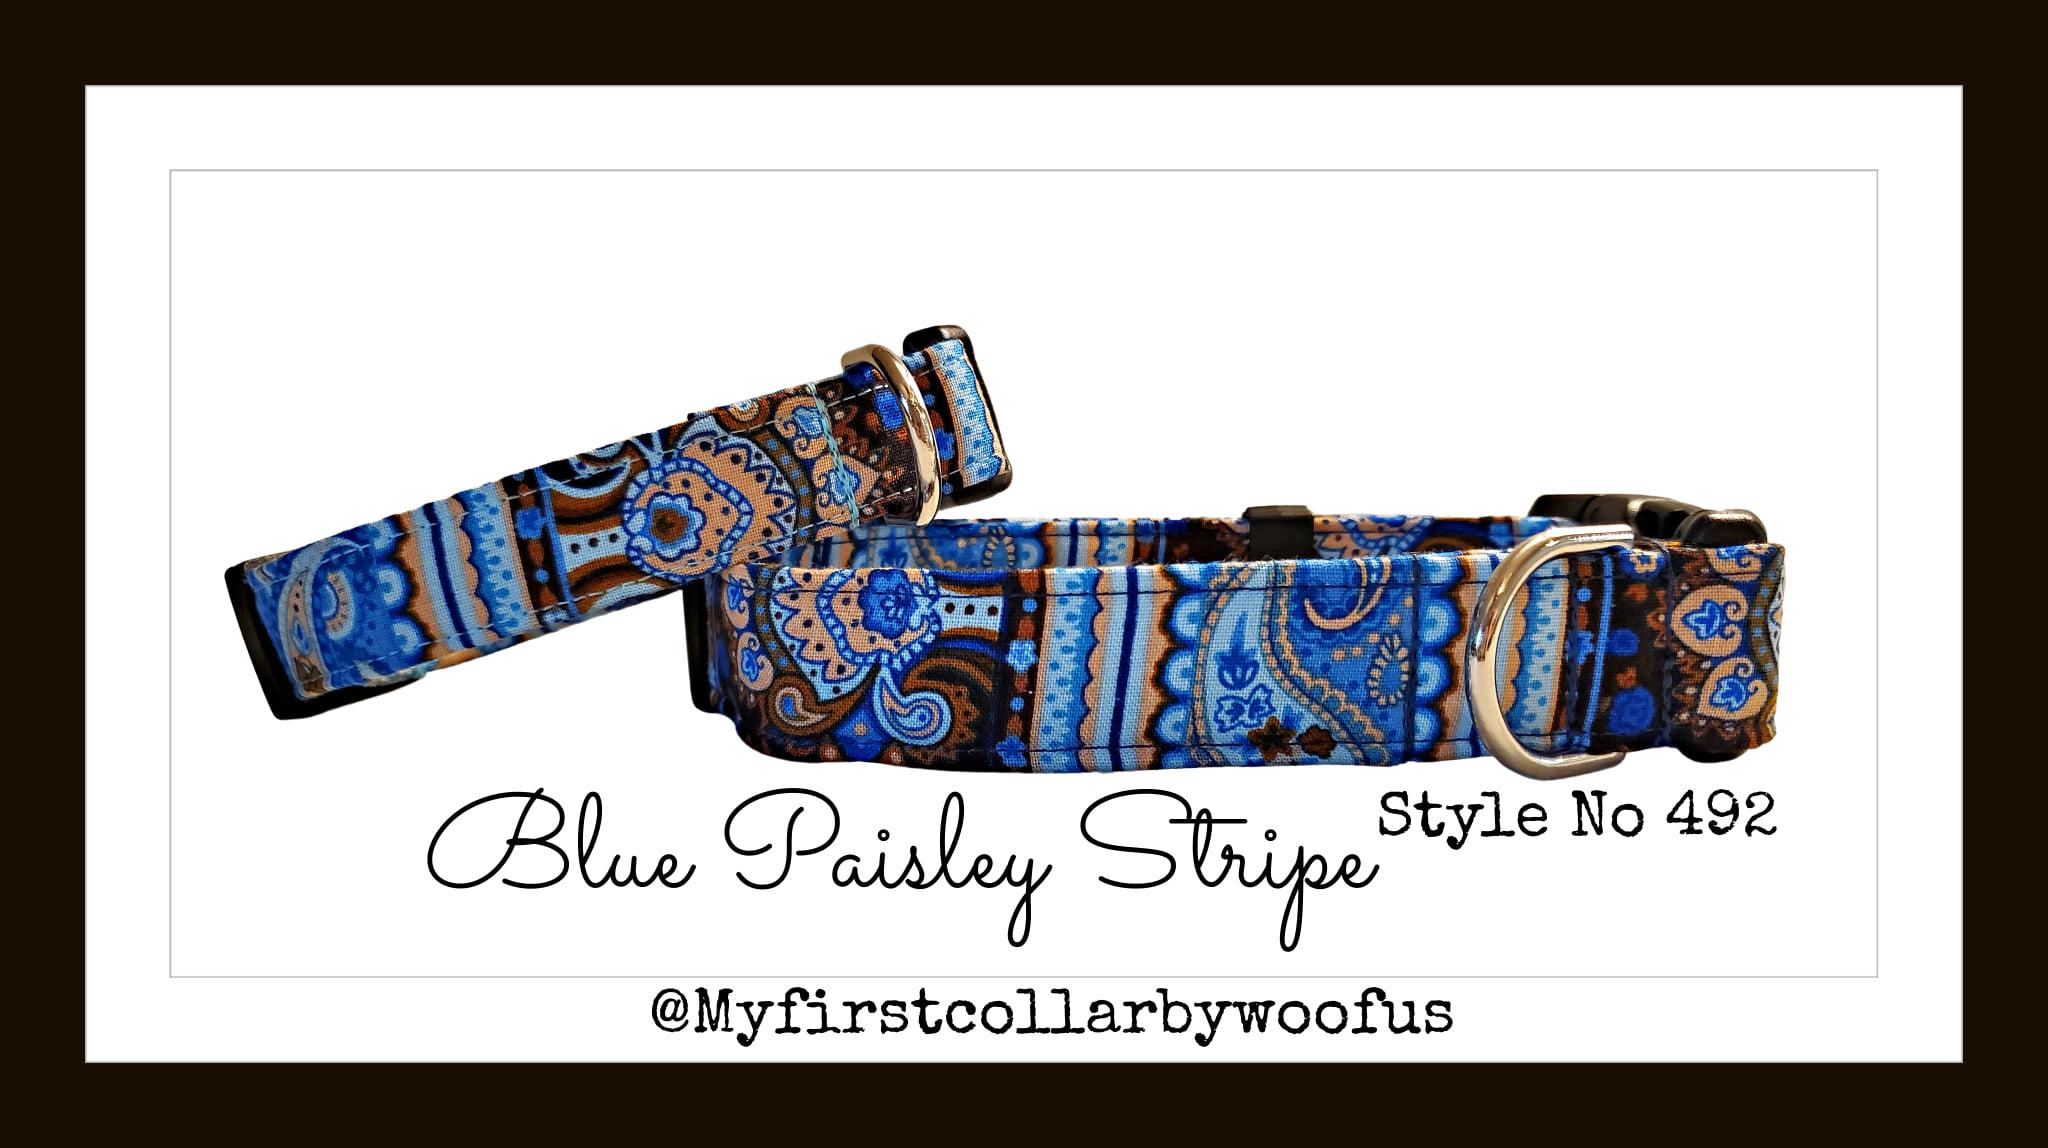 Blue Paisley Stripe 492